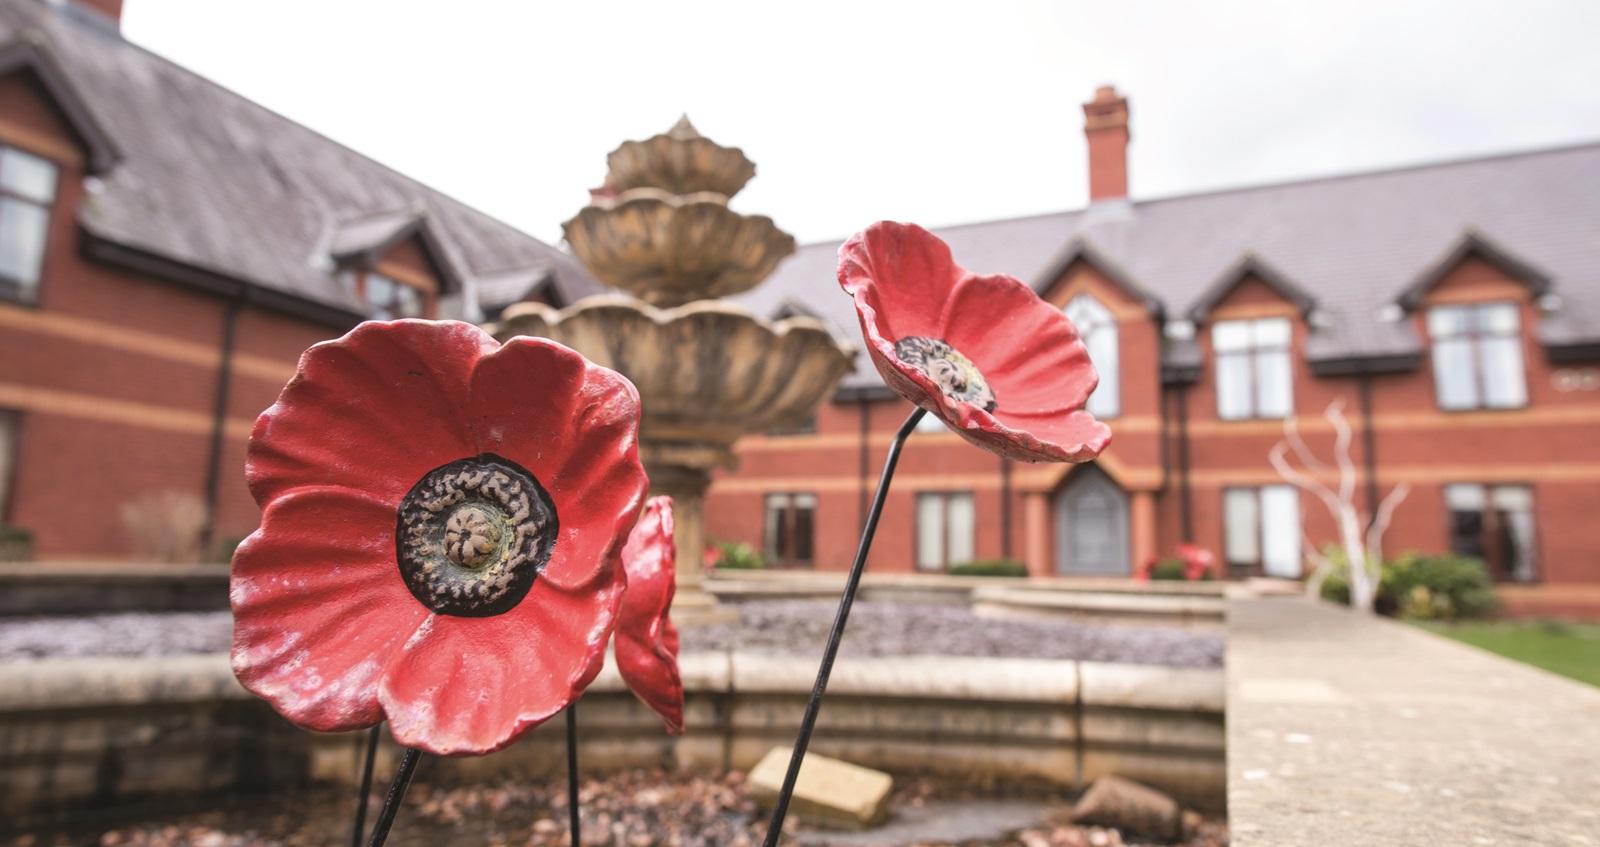 Royal British Legion care home